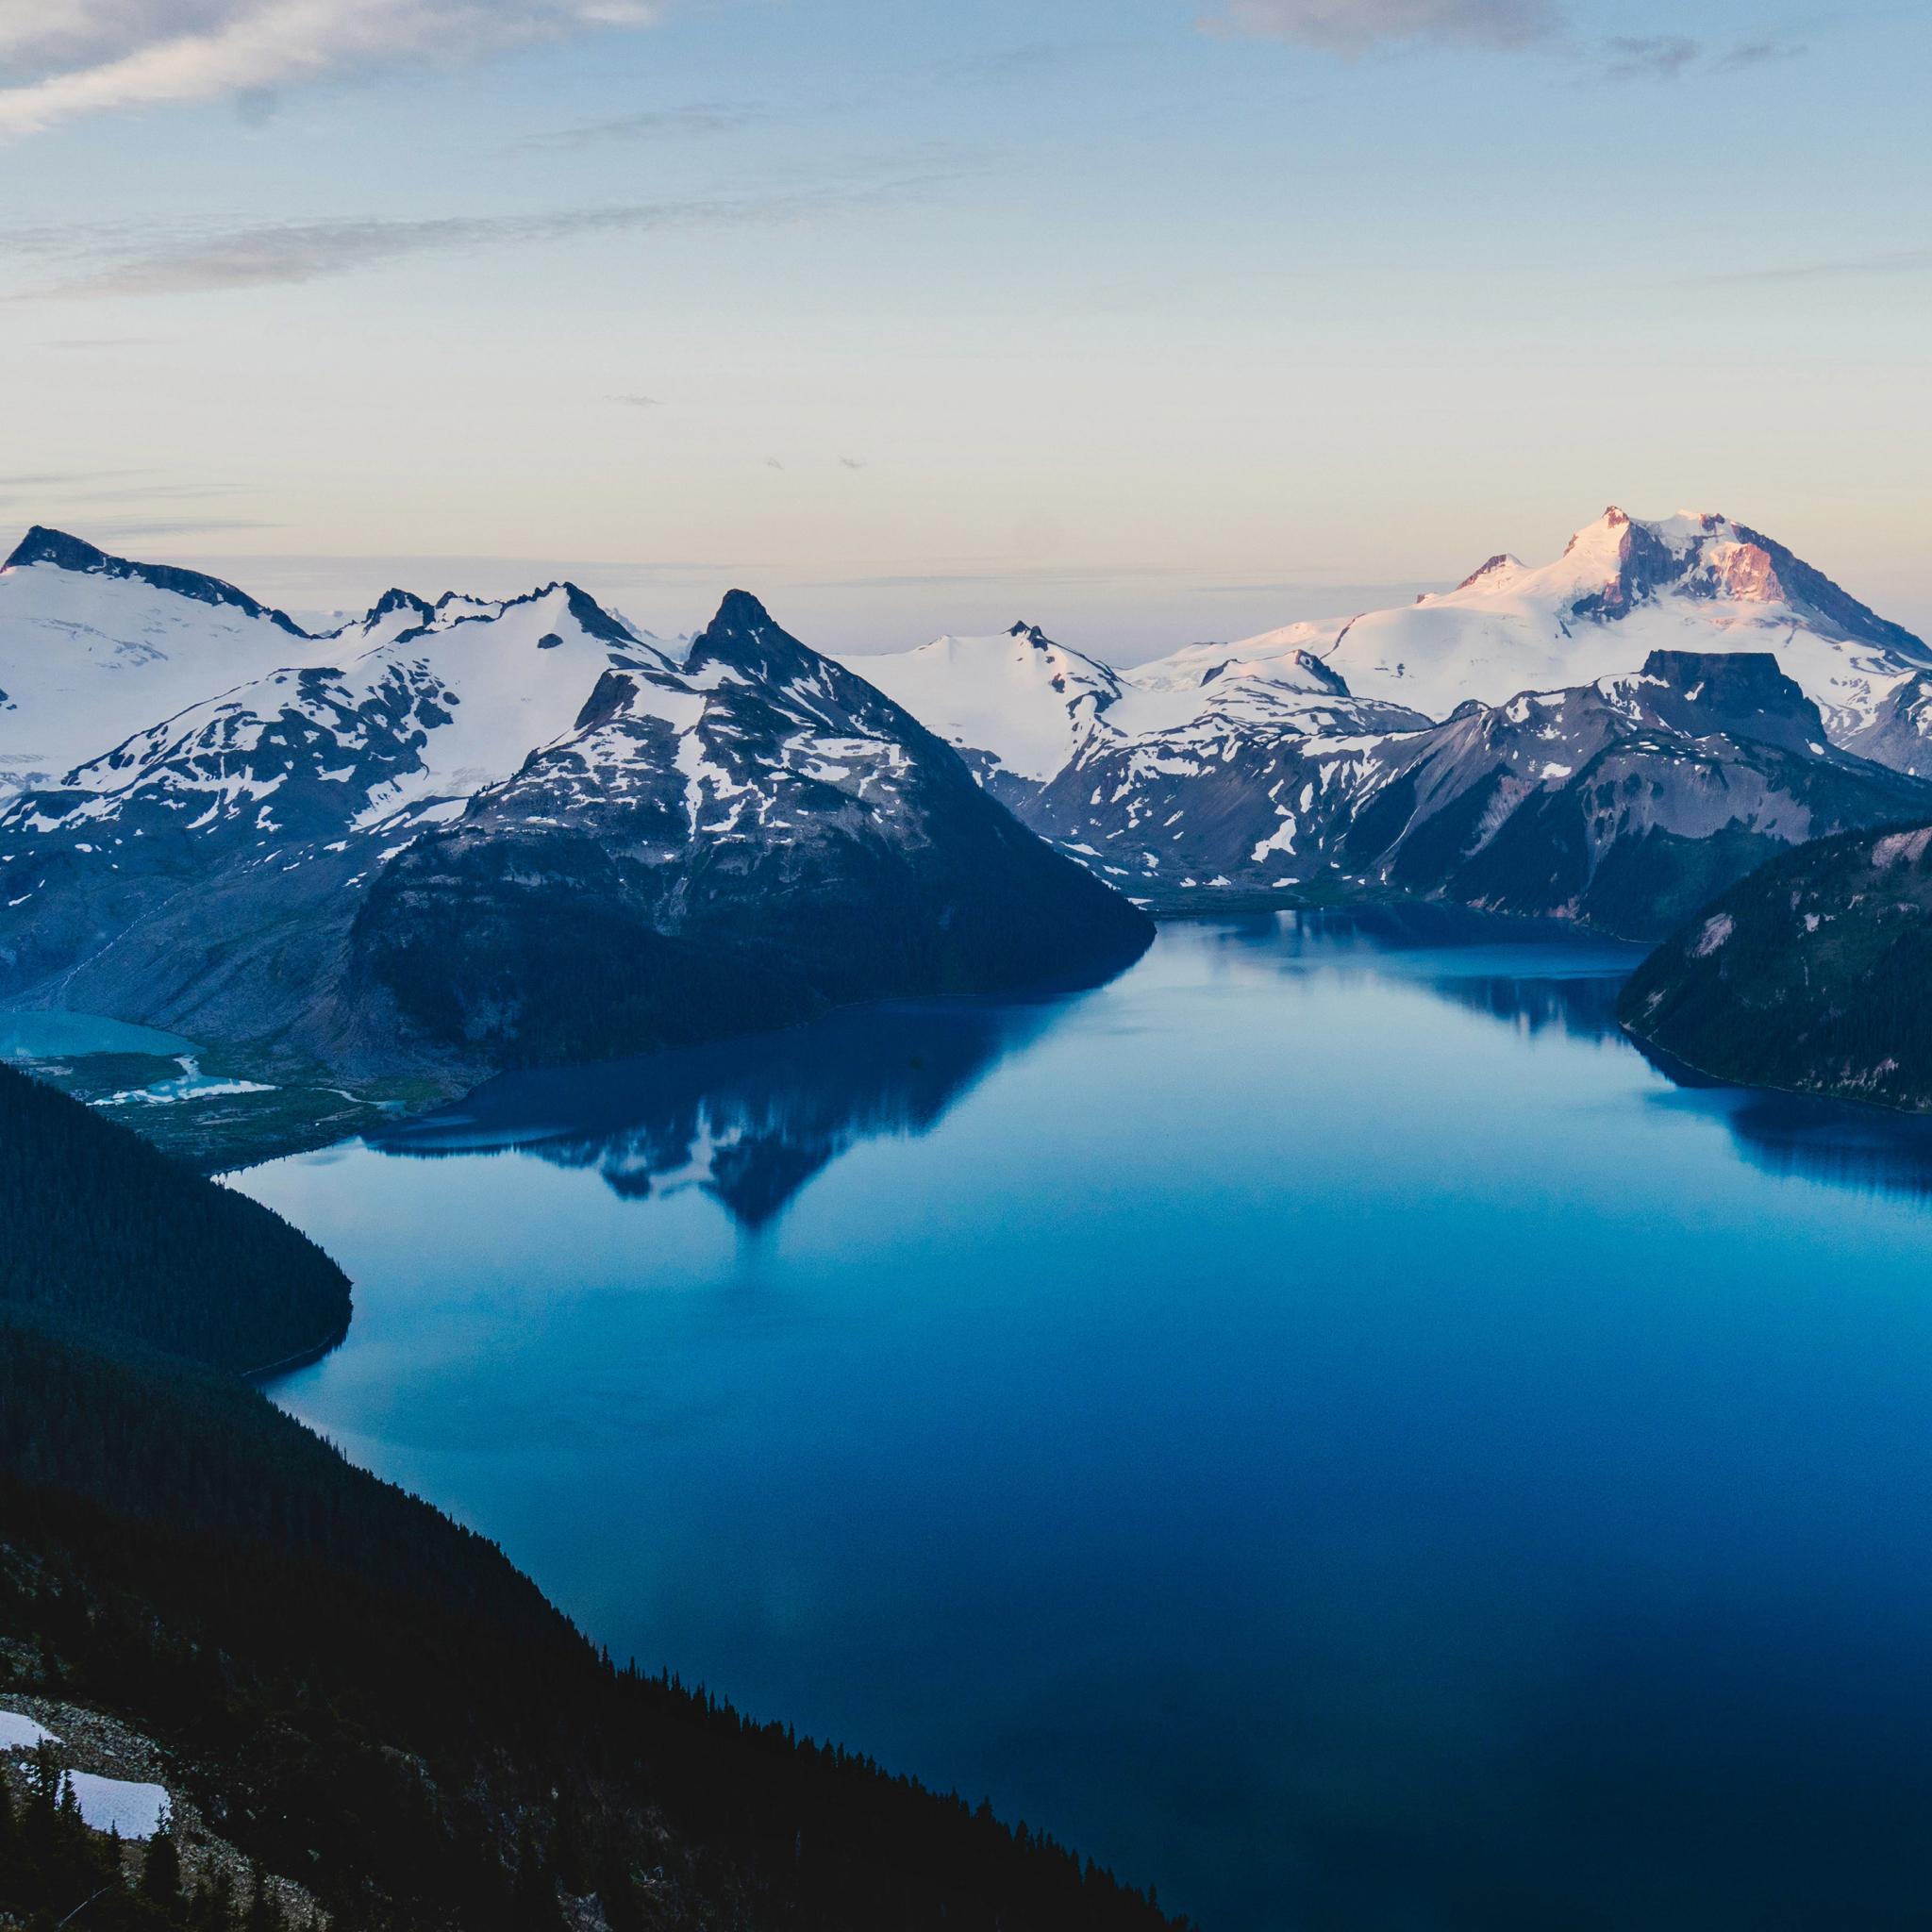 2048x2048 5k Lake Ipad Air Wallpaper, HD Nature 4K ...